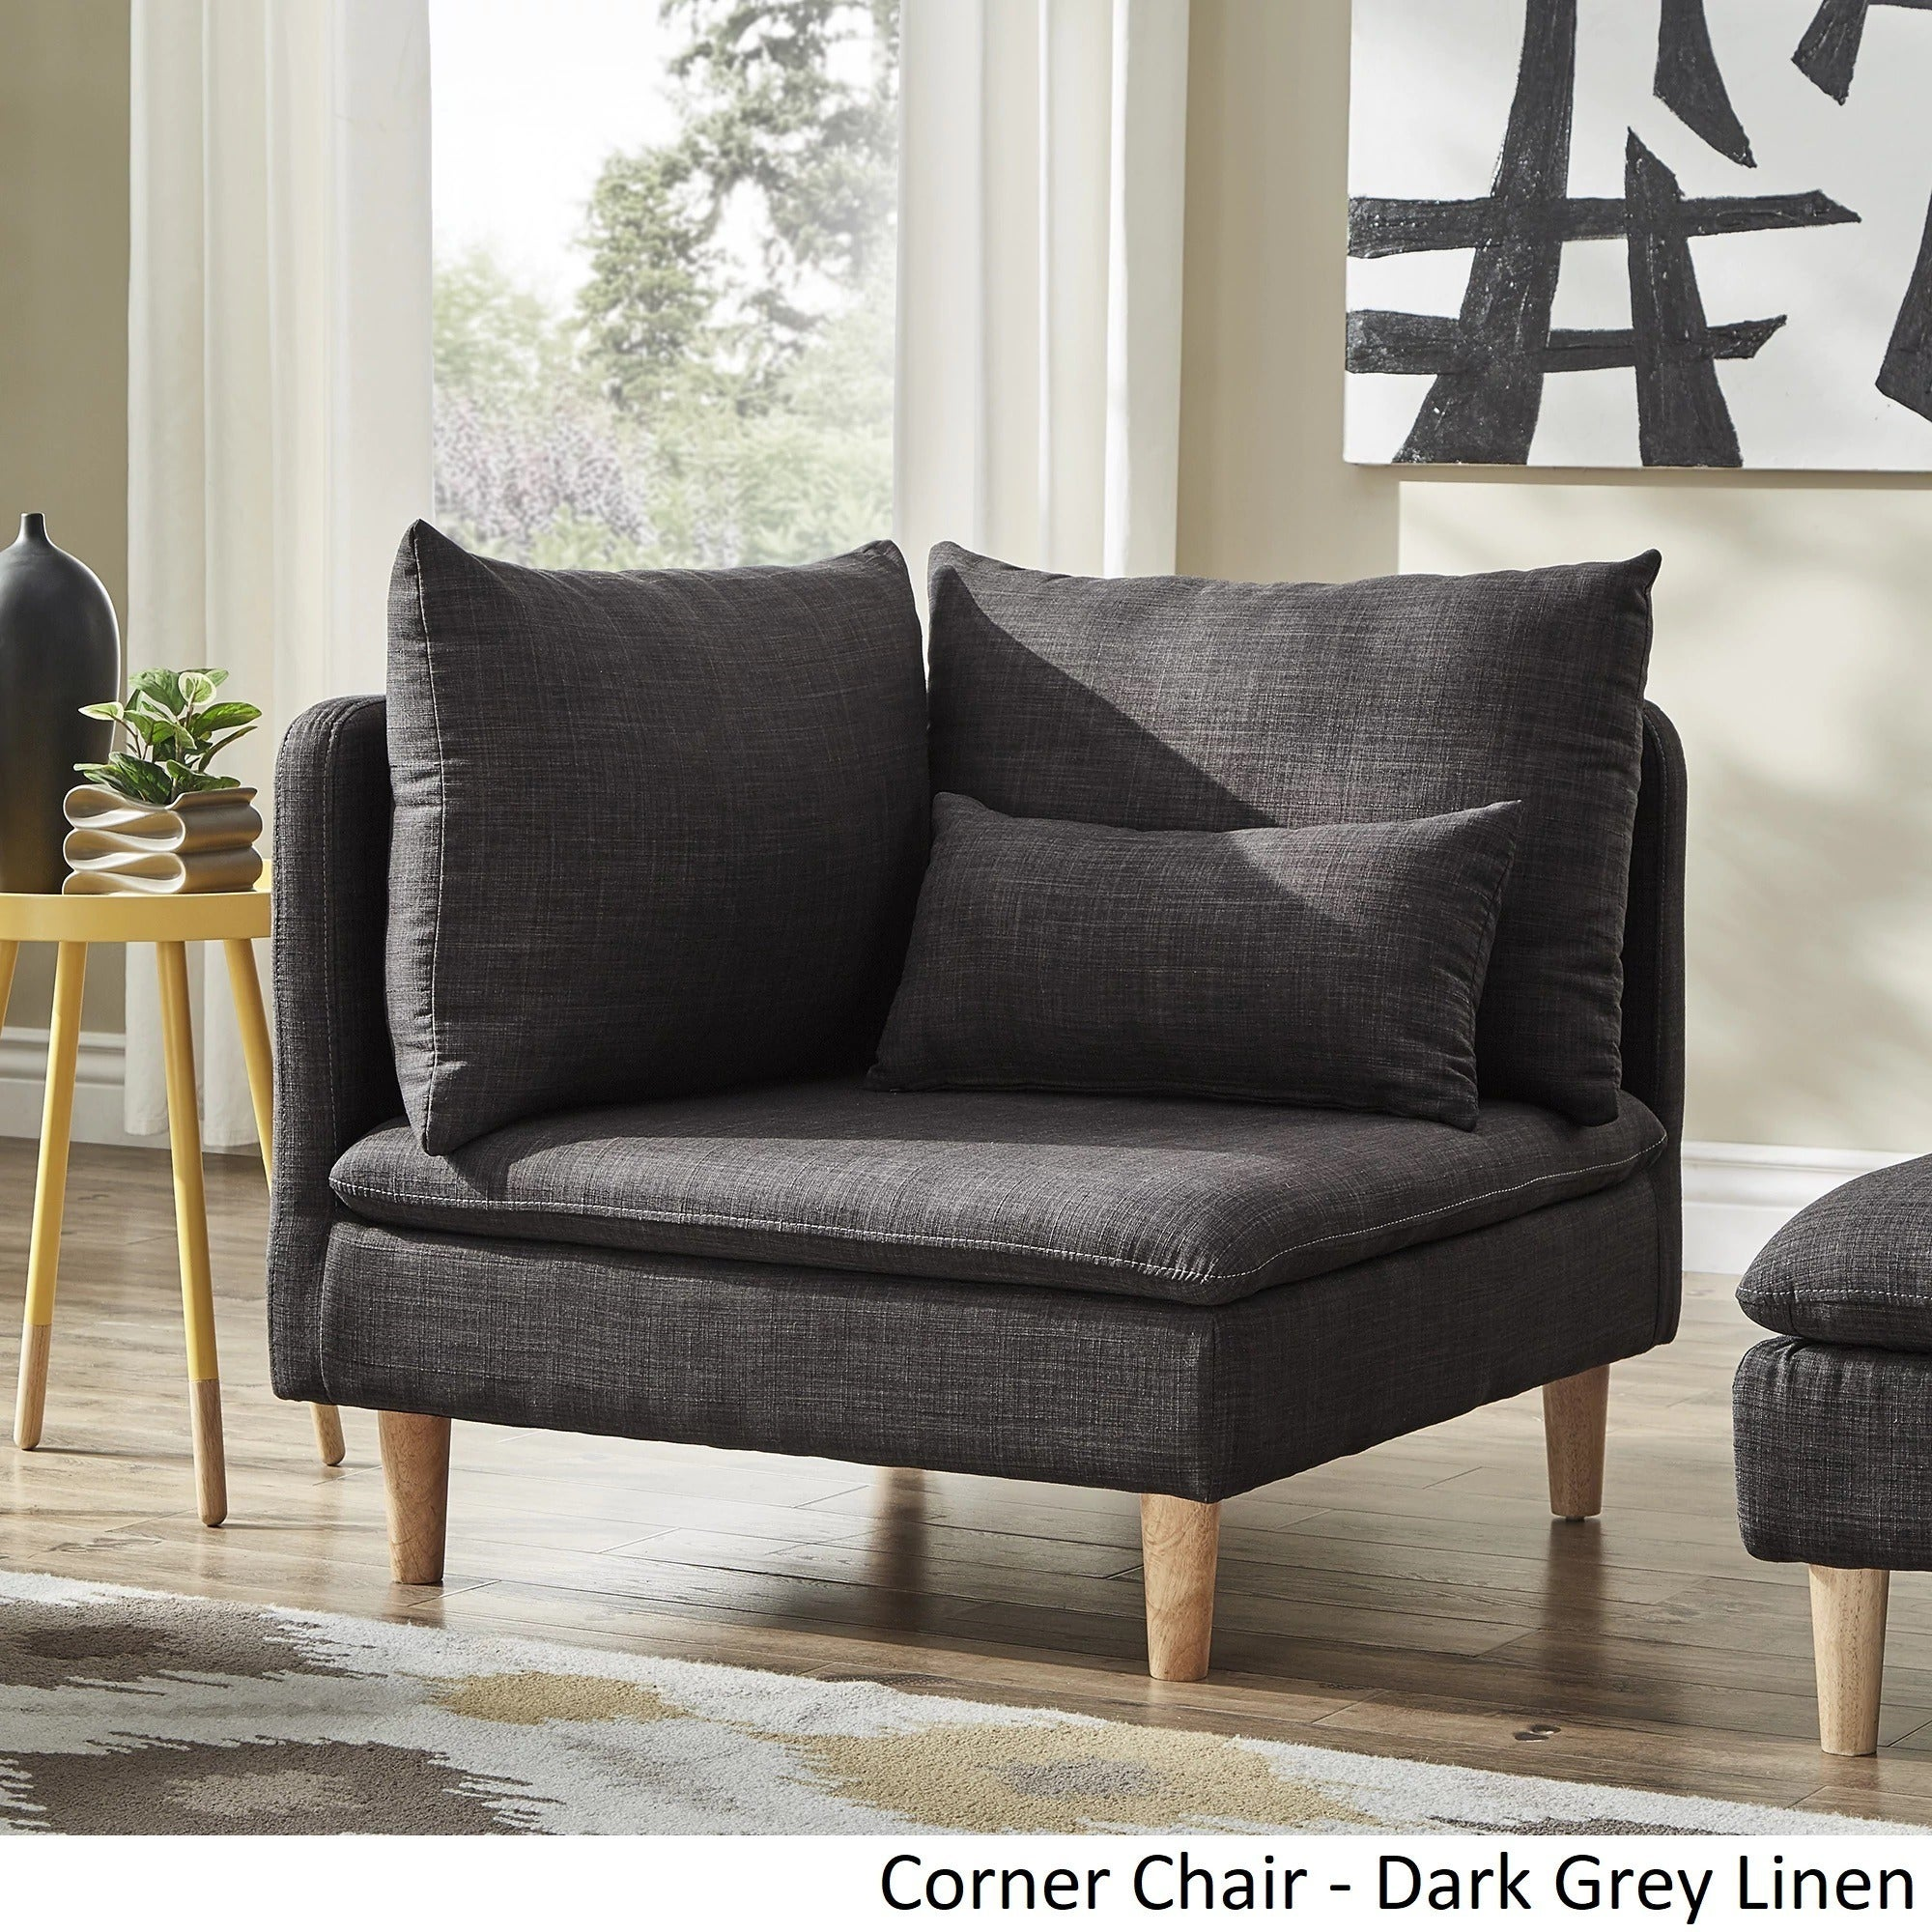 Malina Modular Mid Century Chair And Ottoman By Inspire Q Modern